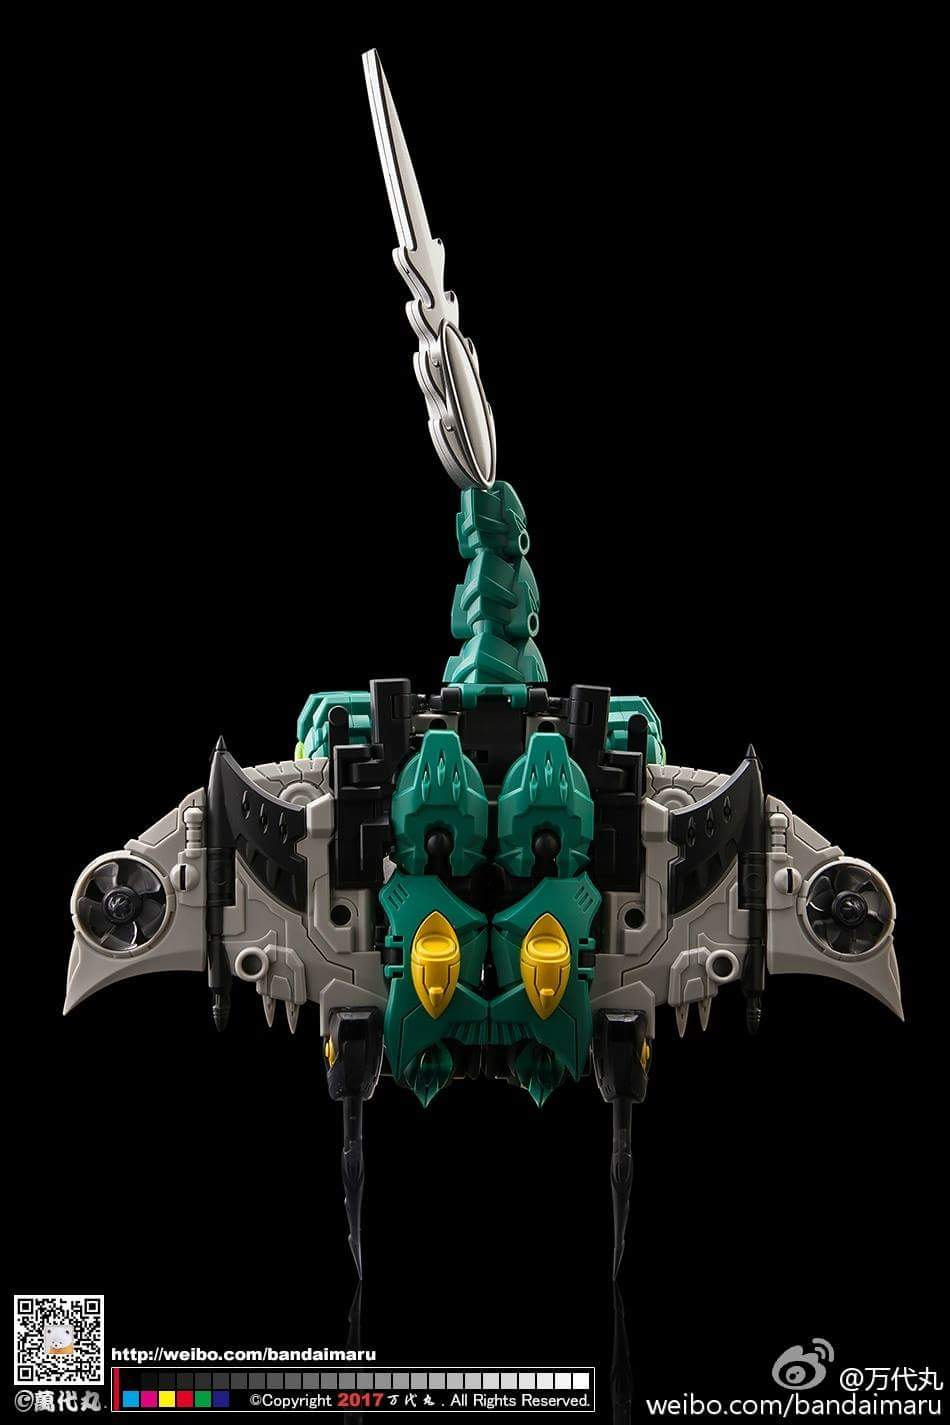 [TFC Toys] Produit Tiers - Jouet Poseidon - aka Piranacon/King Poseidon (TF Masterforce) - Page 4 XMFRwlYB